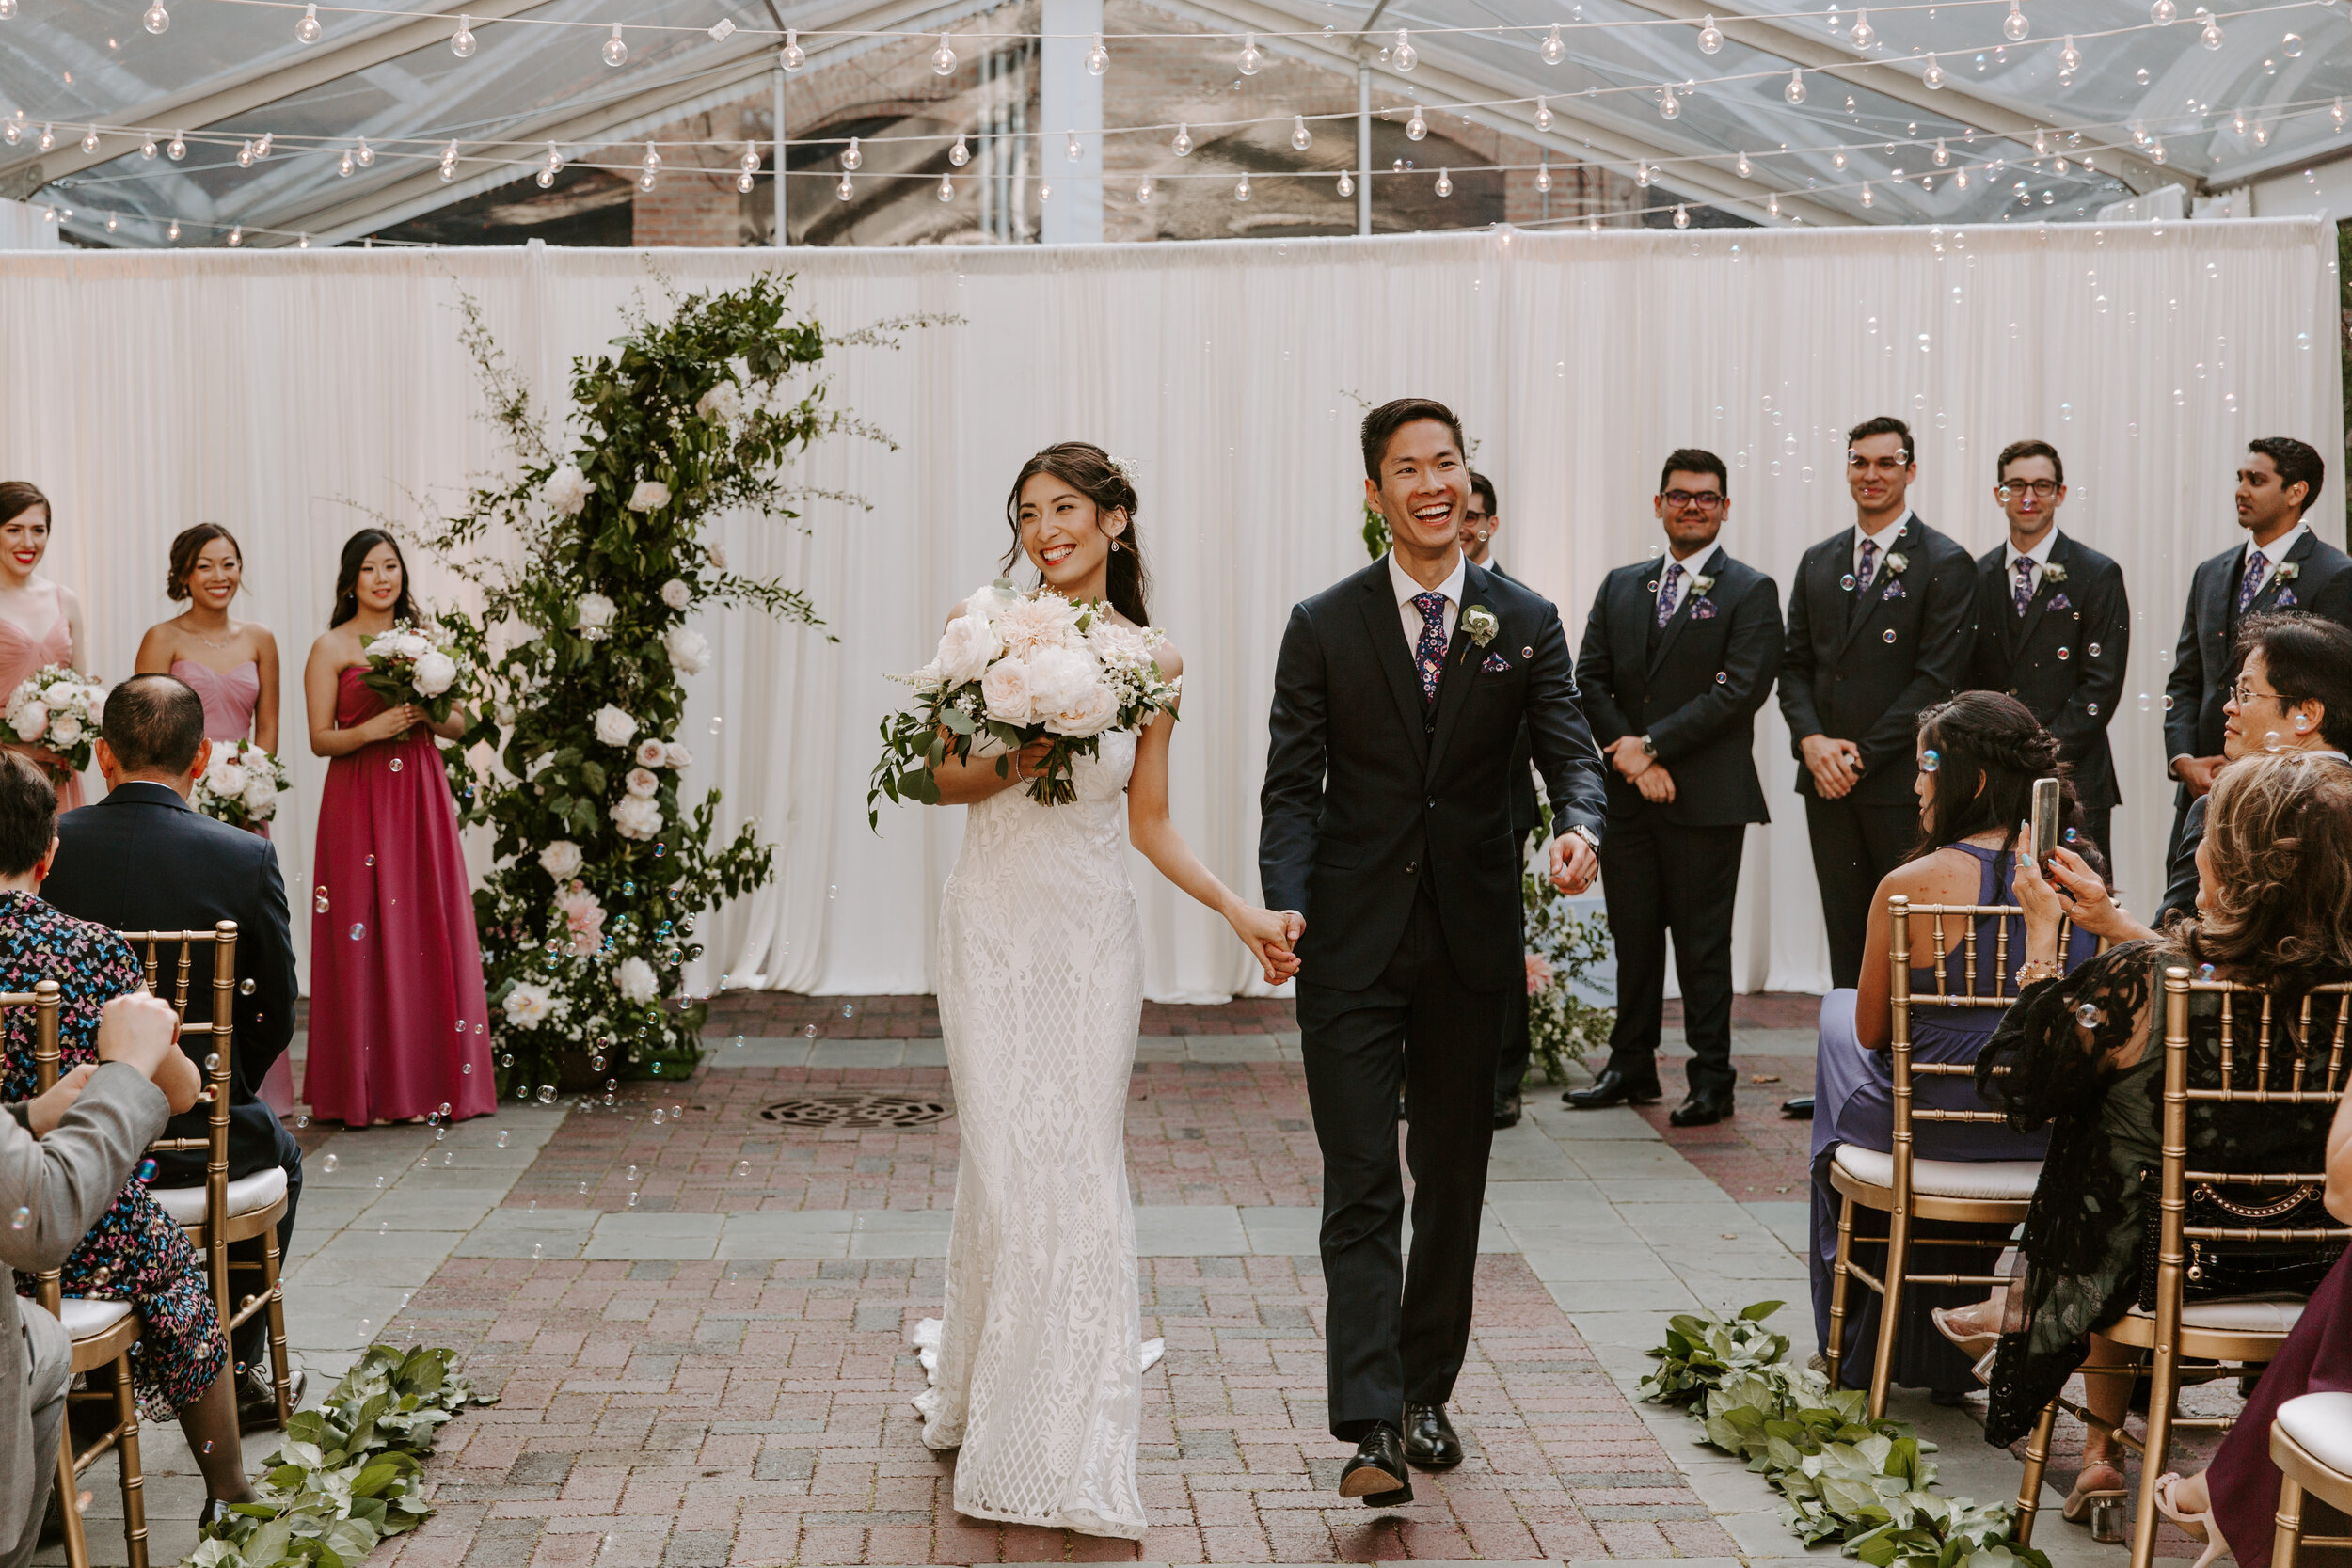 quan wedding-251.jpg